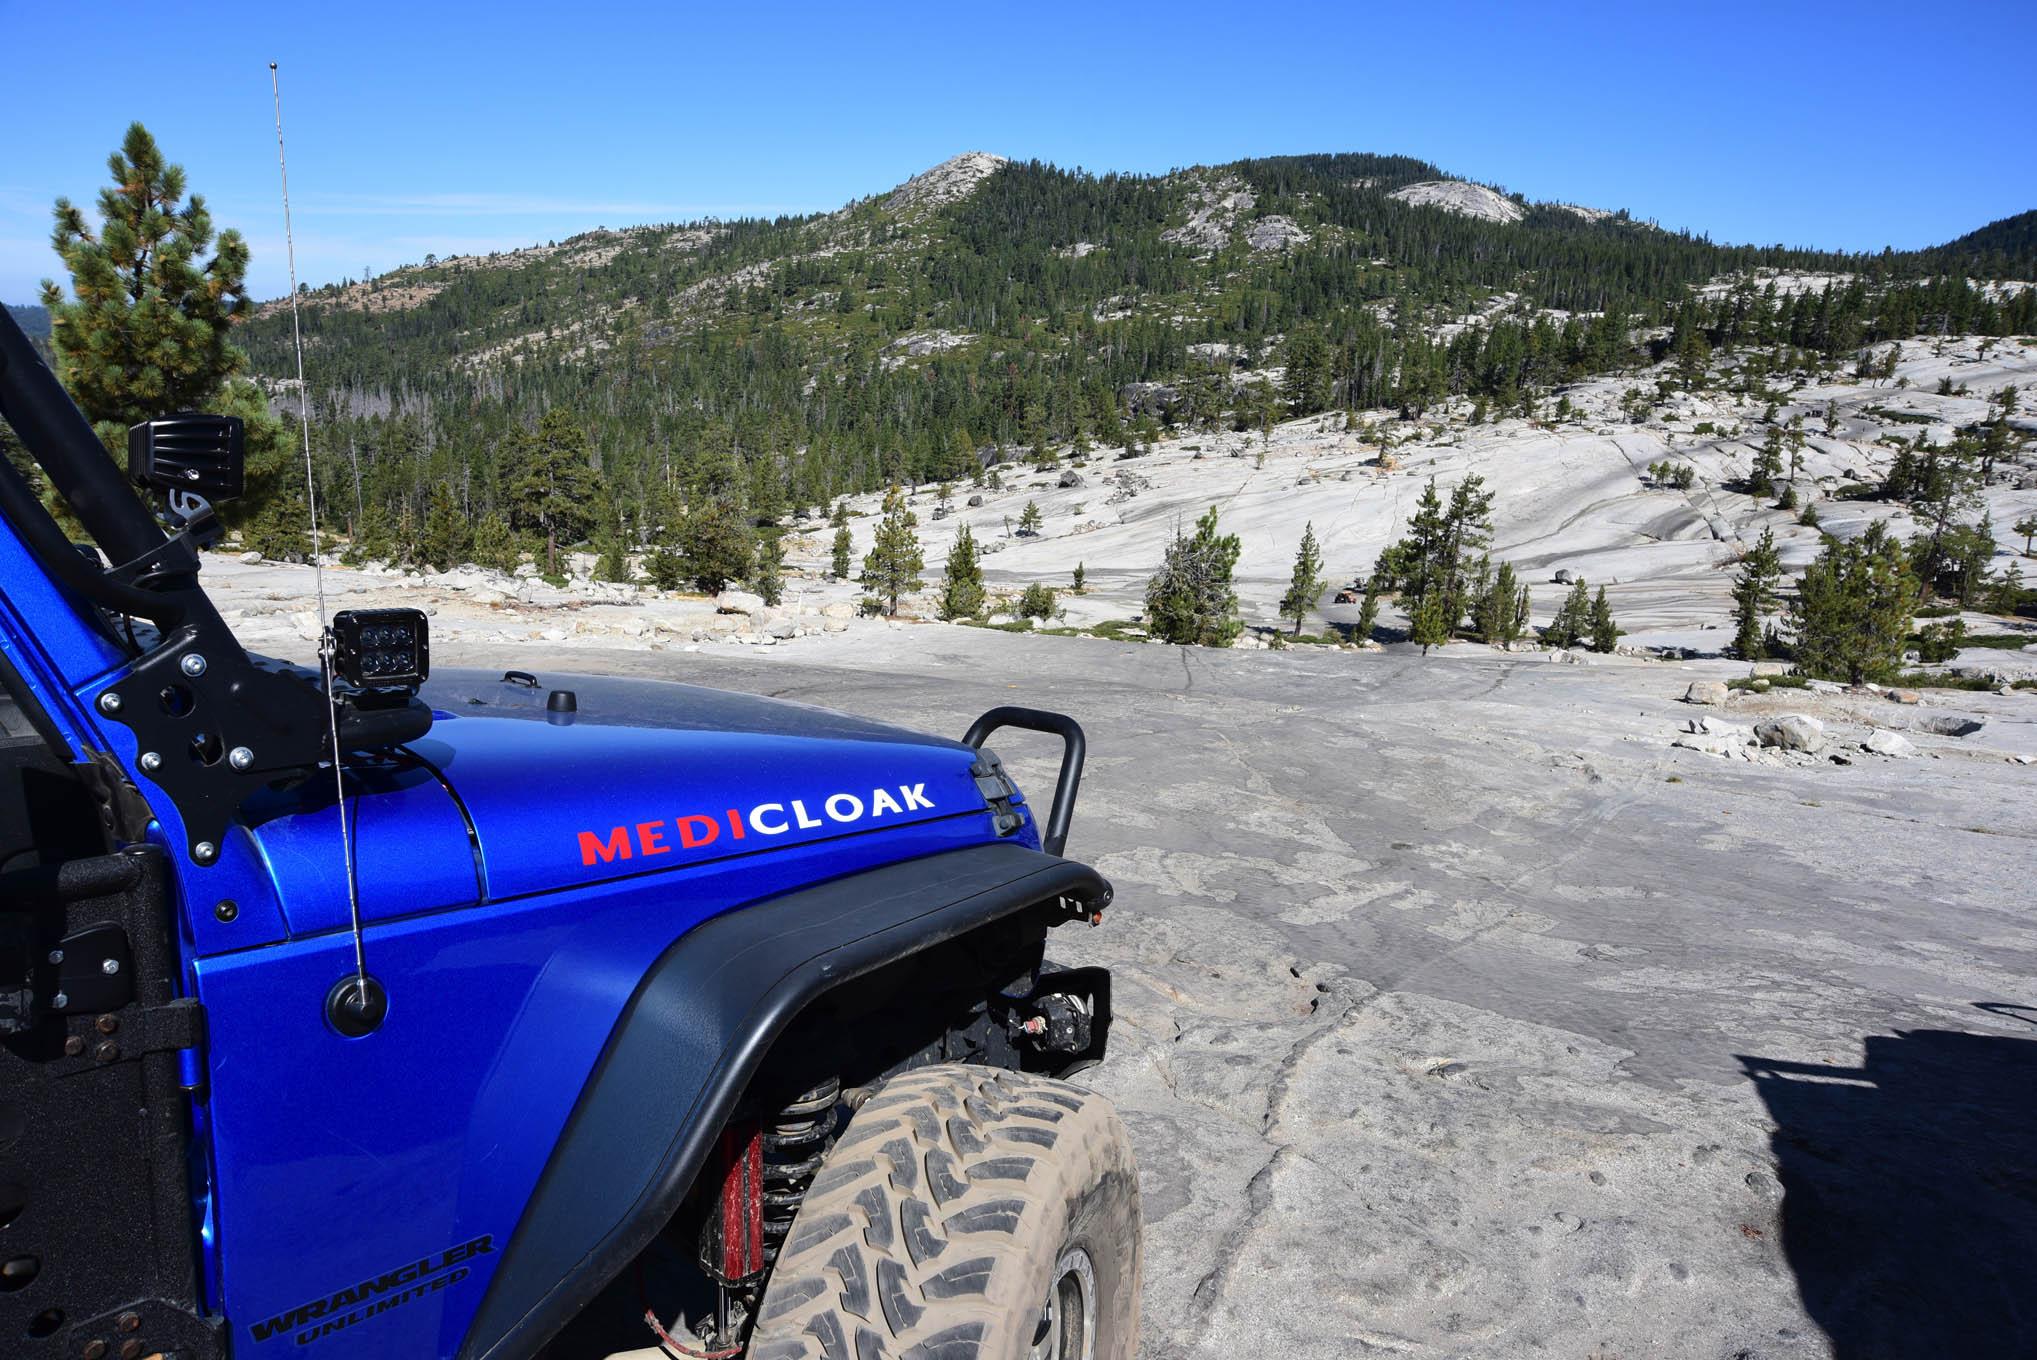 028 rubicon trail modern jeeper adventures metal cloak 2019 stuart bourdon